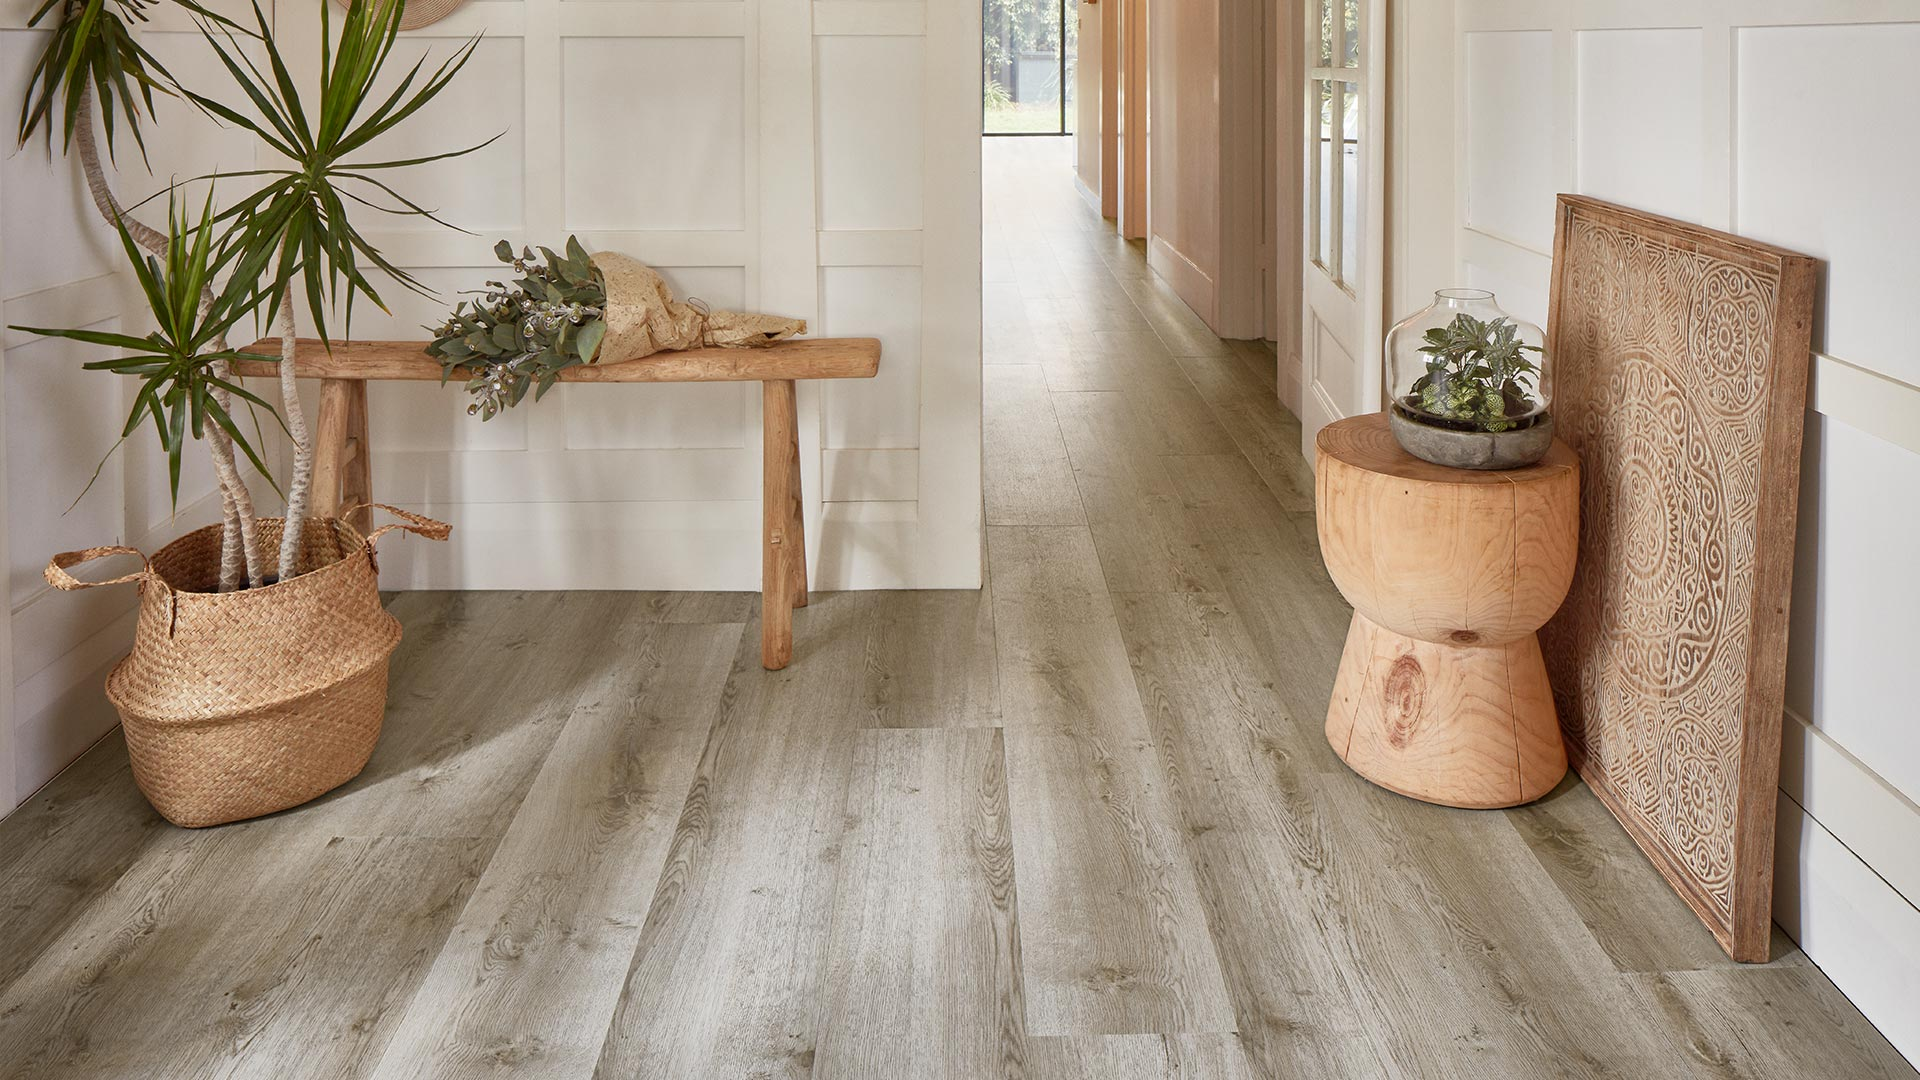 6 Major Benefits of Wood Flooring